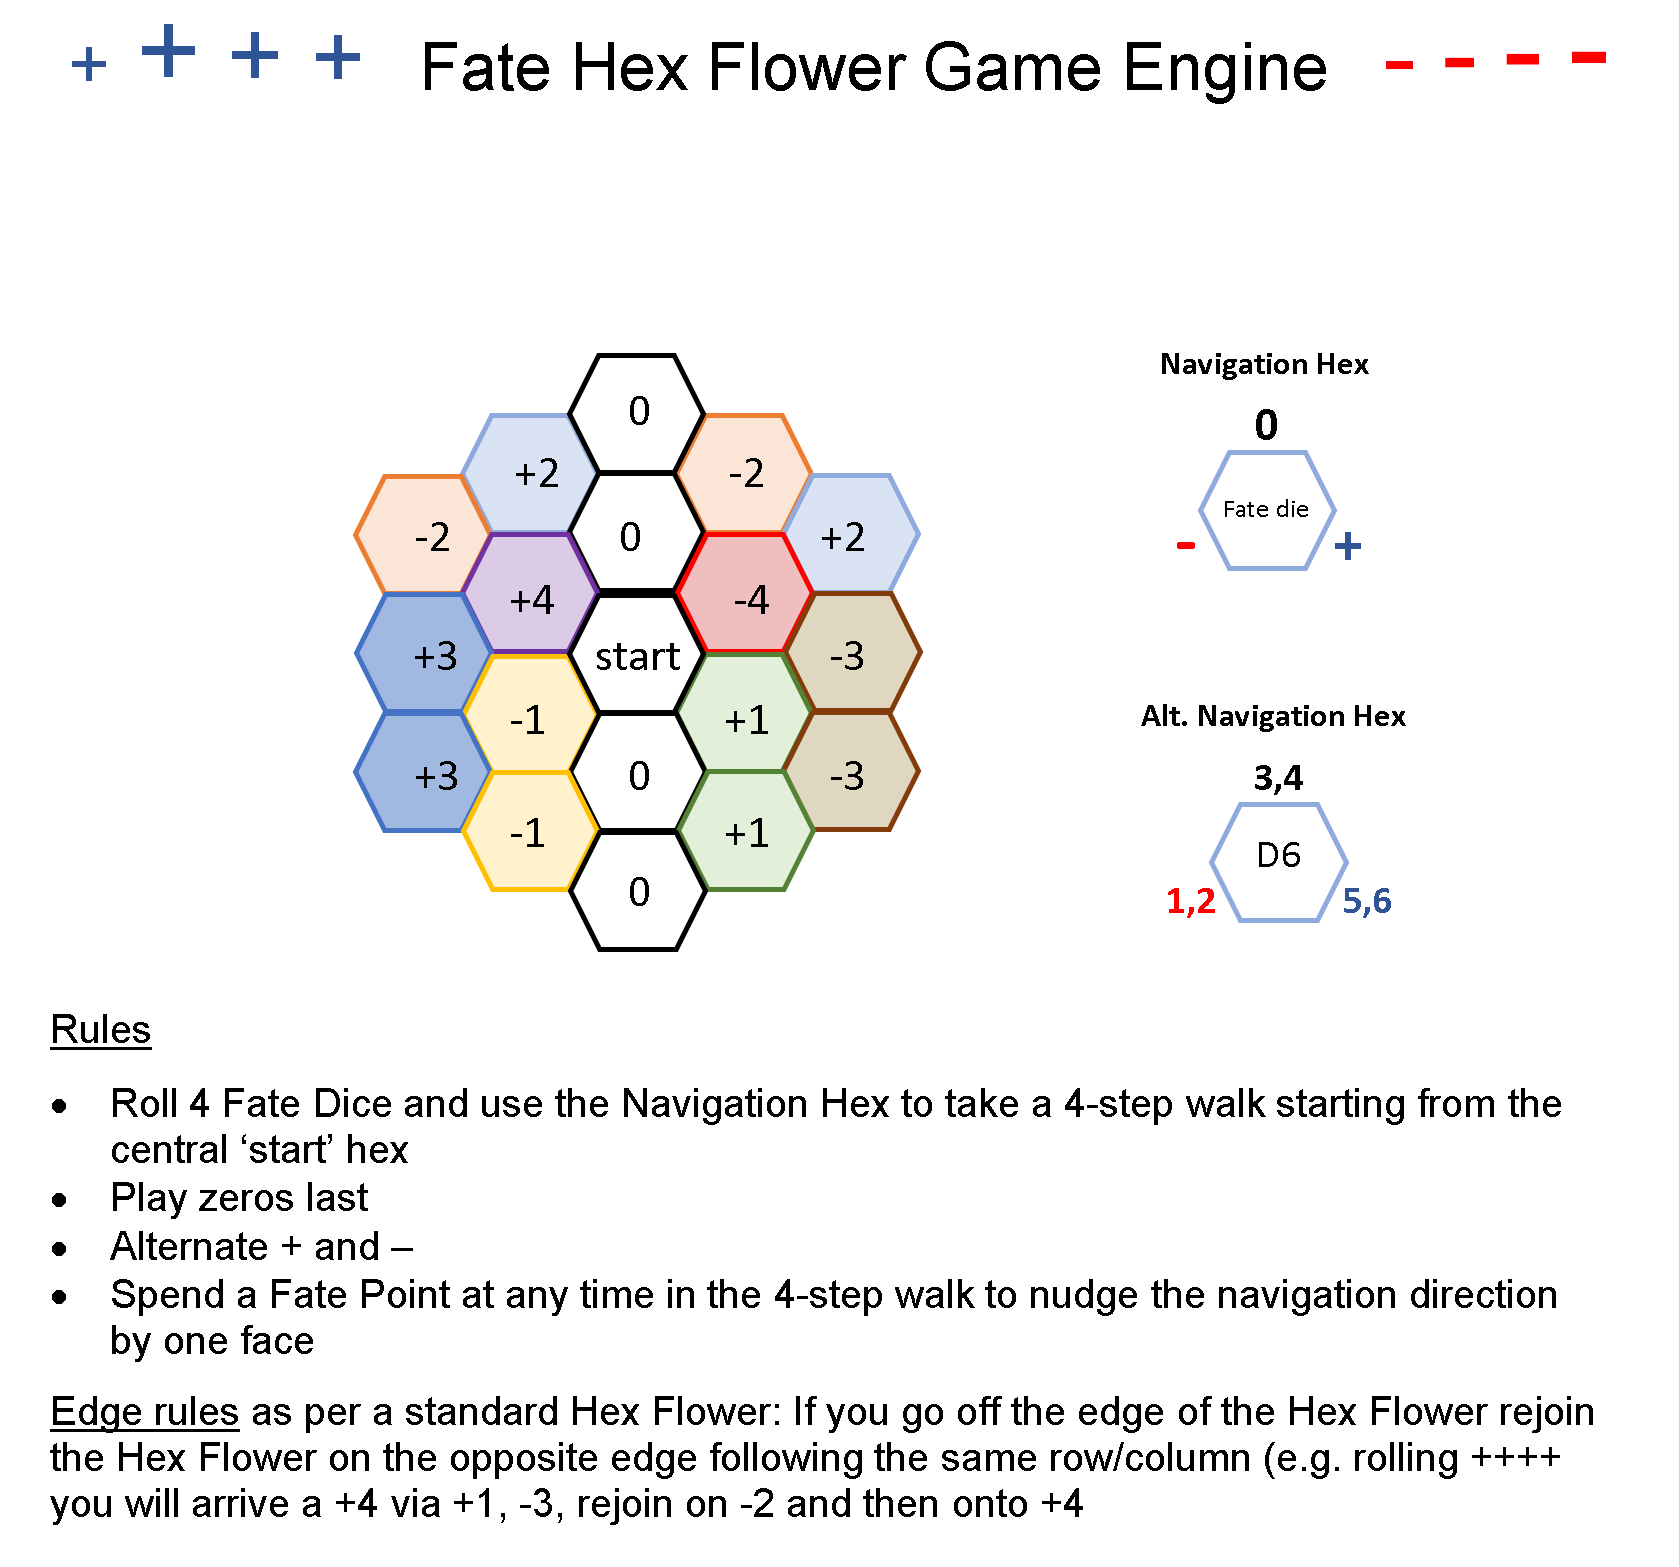 Fate Hex Flower - Draft